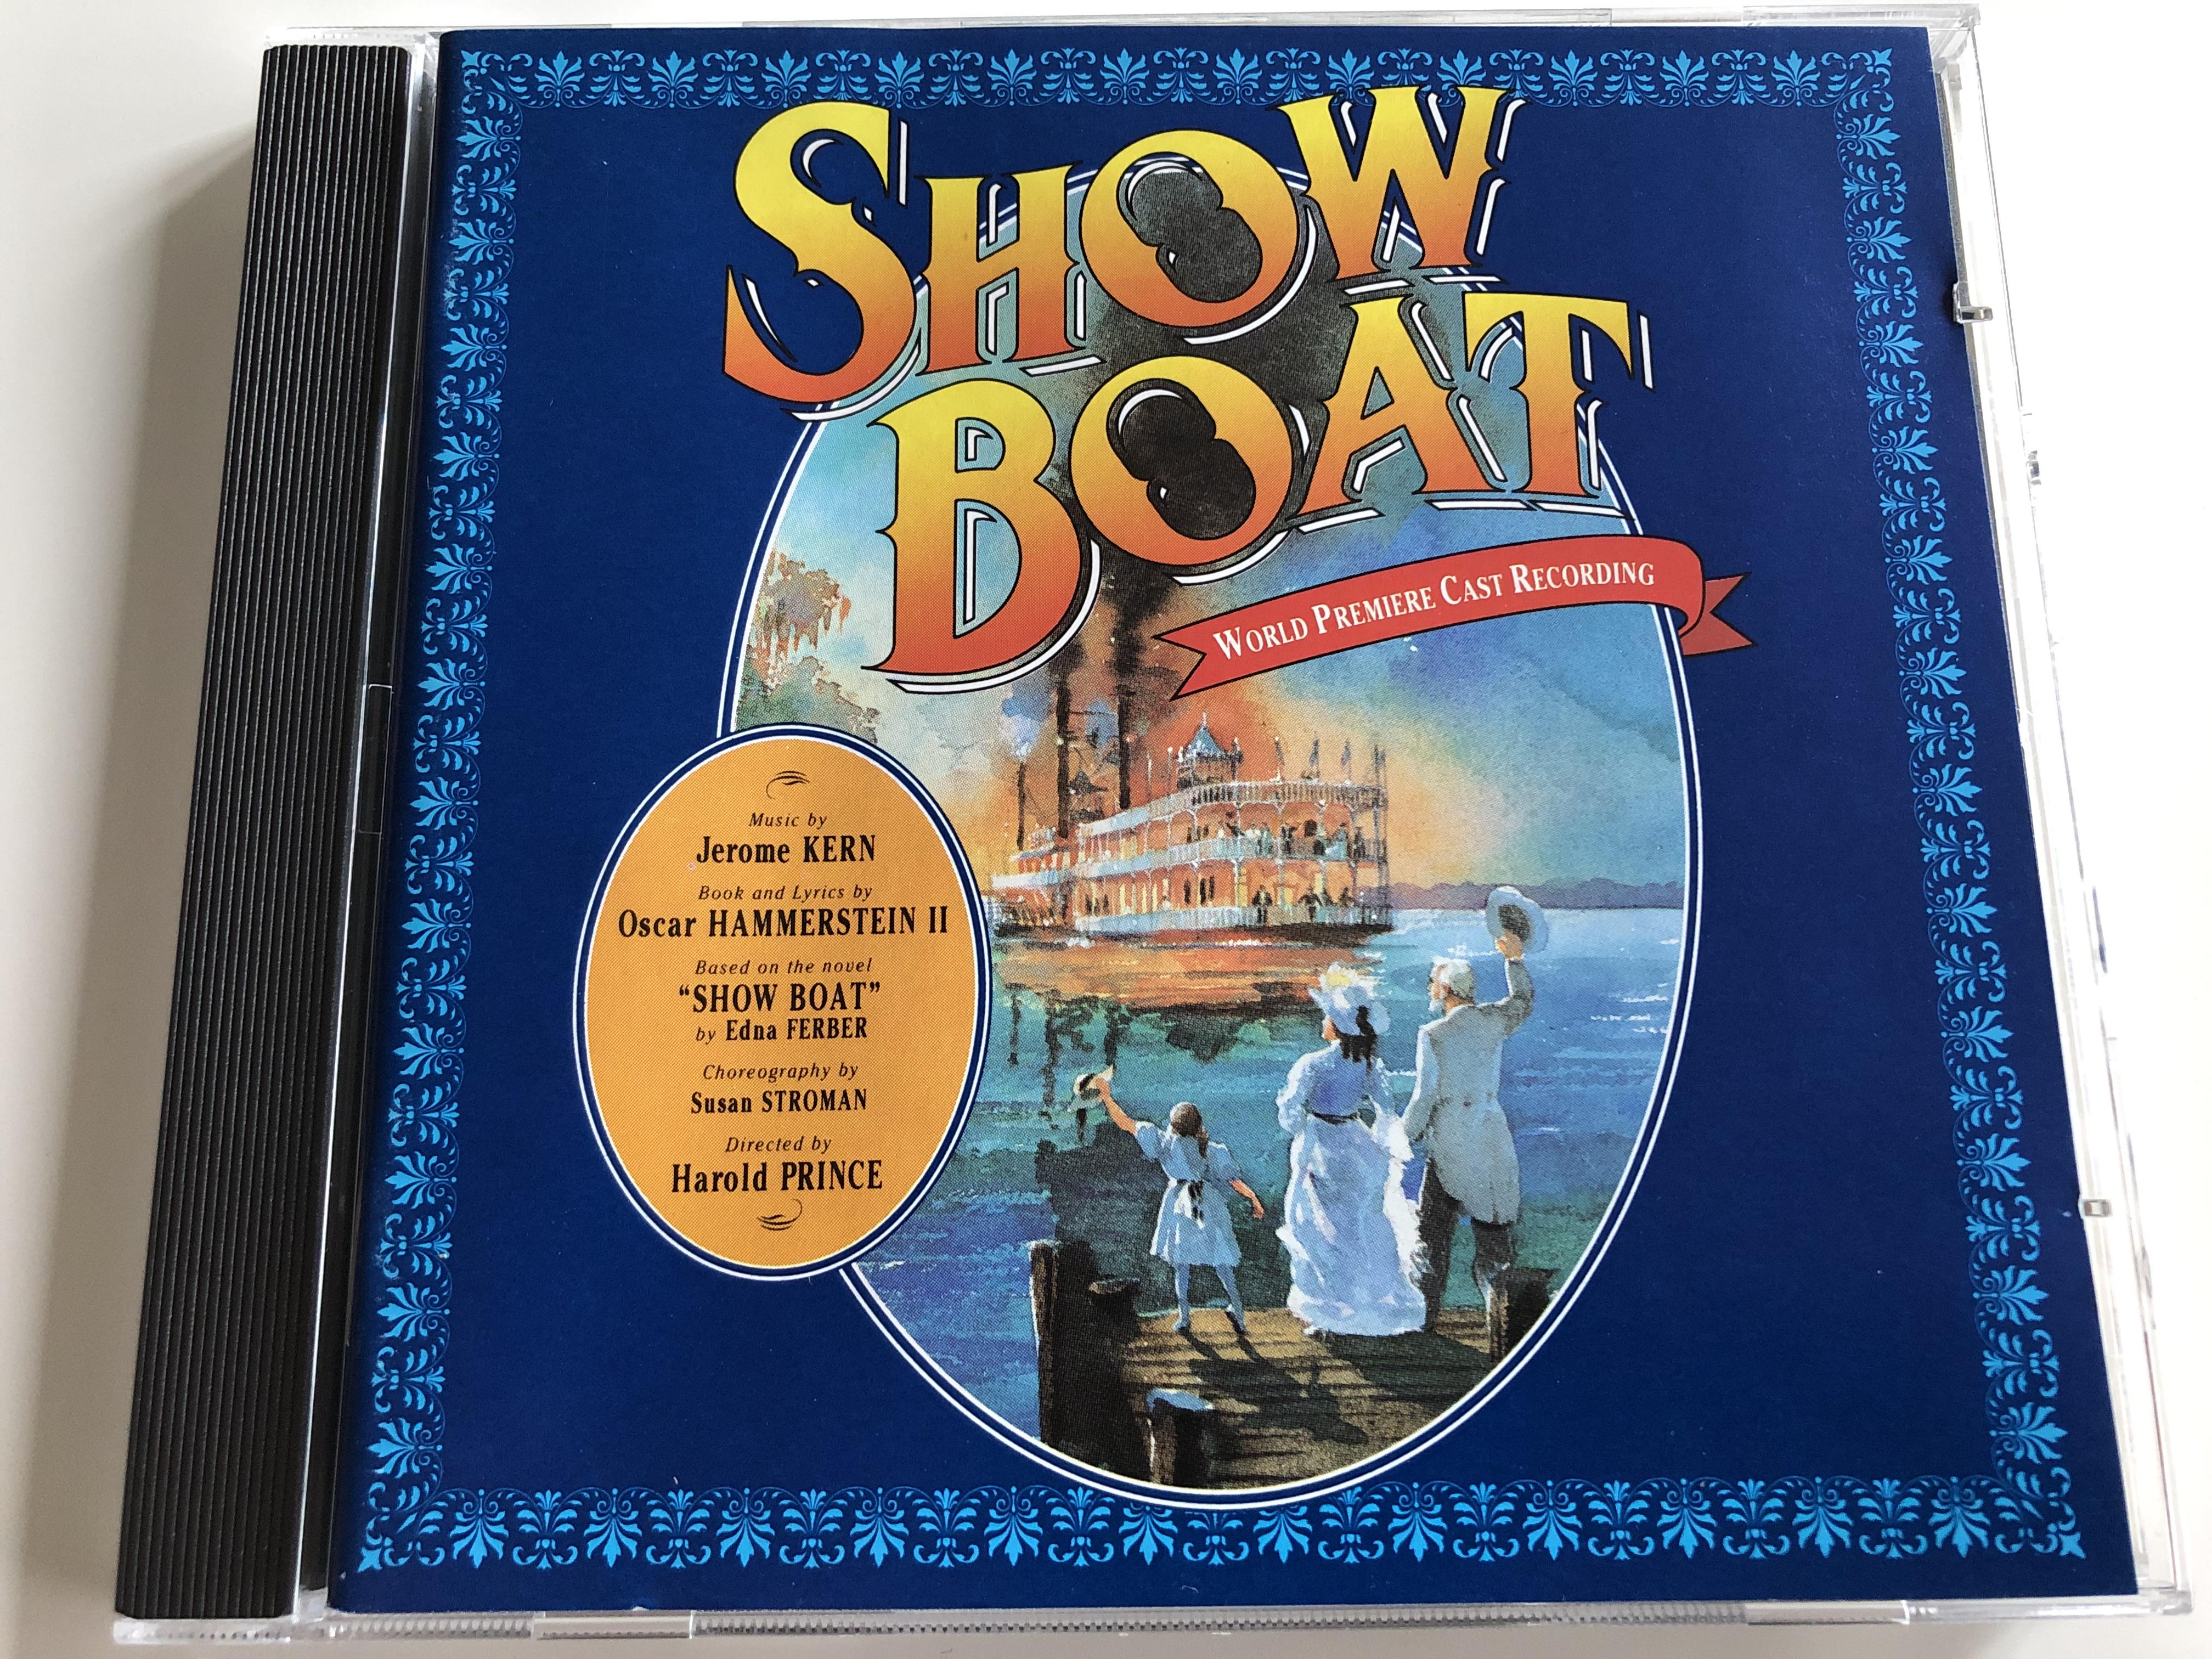 show-boat-jerome-kern-oscar-hammerstein-ii-edna-ferber-susan-stroman-harold-prince-quality-music-audio-cd-1994-rspd-257-1-.jpg